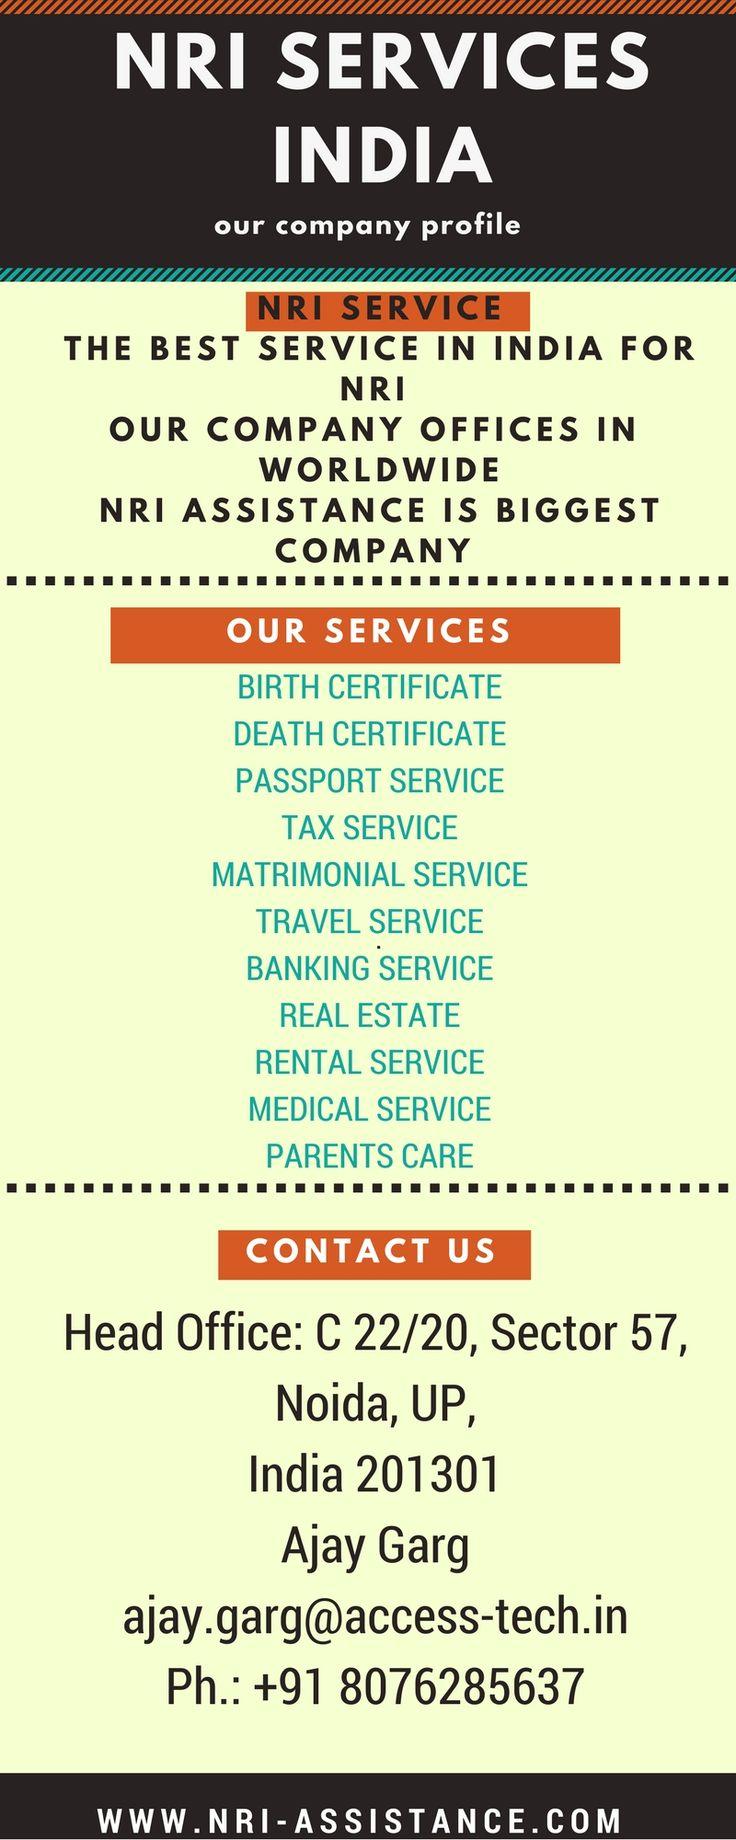 Nri Service In India, Birth Certificate, Tax Service, And Passport Service